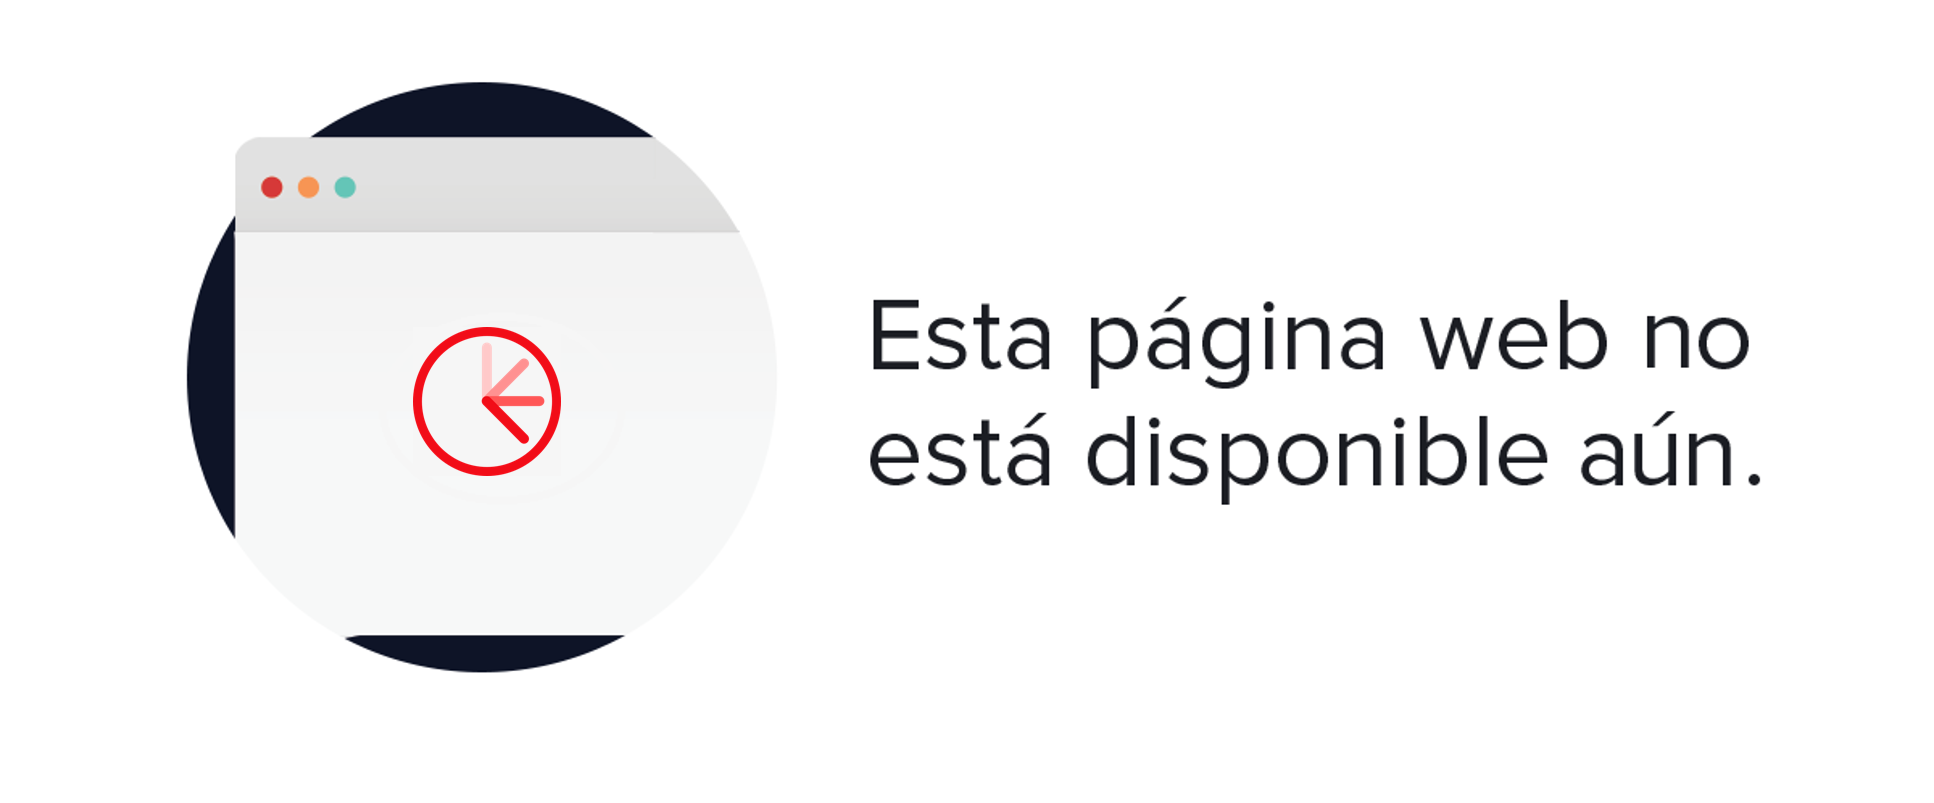 Easy Wear - Pantalón pitillo de mujer Easy Wear de punto roma Negro 001041572101768034 - WYINKWI